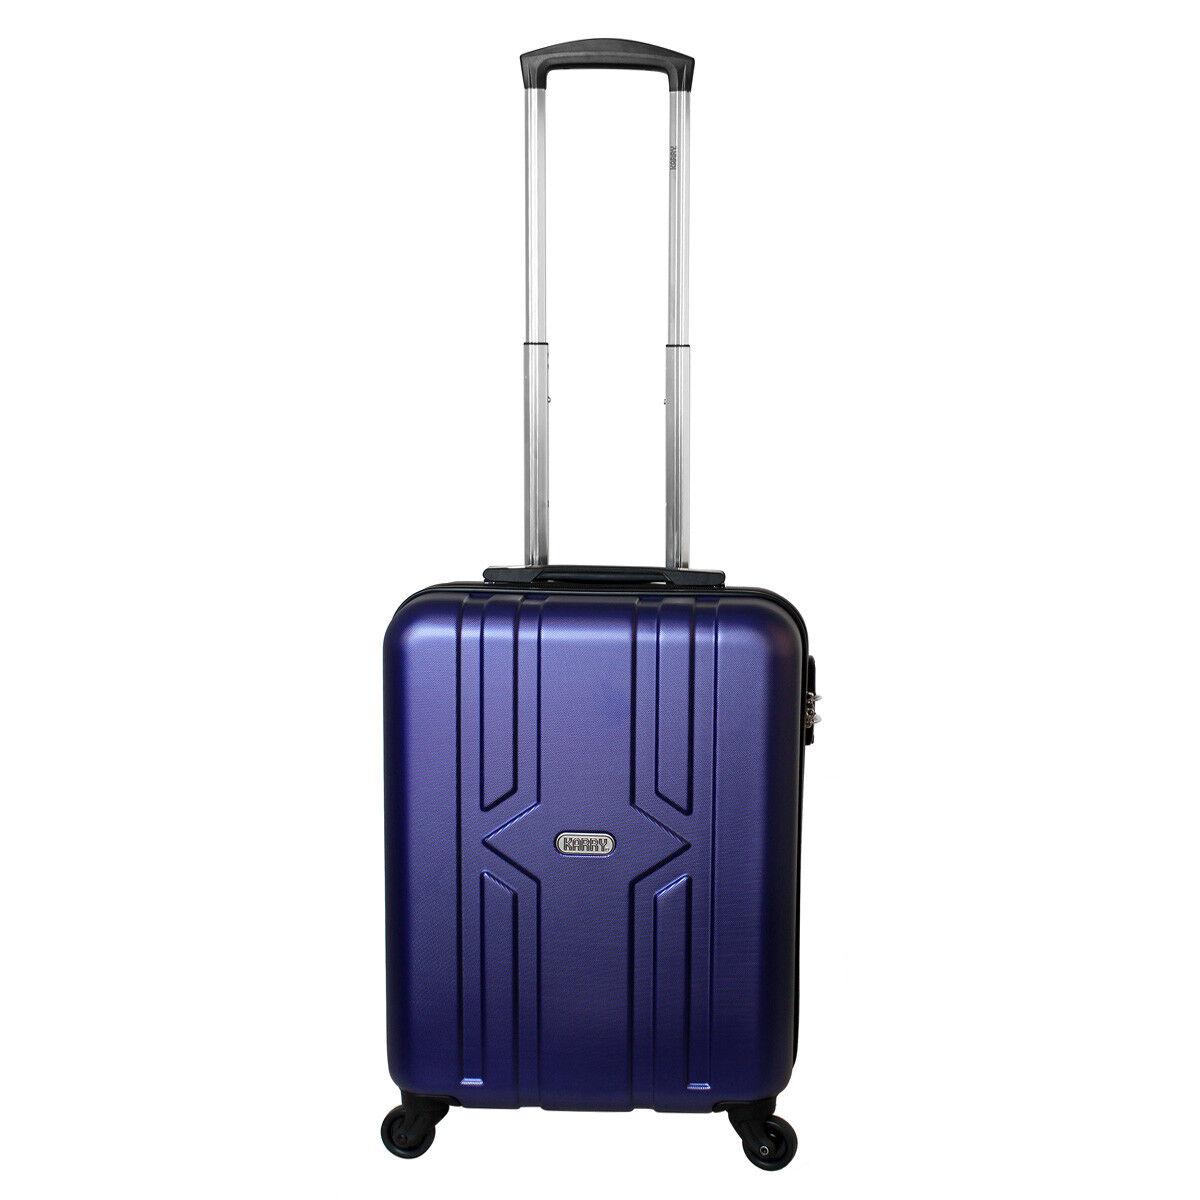 Bagages à Main Valise Rigide Voyage Trolley Cabine 30 Litre bleu 821